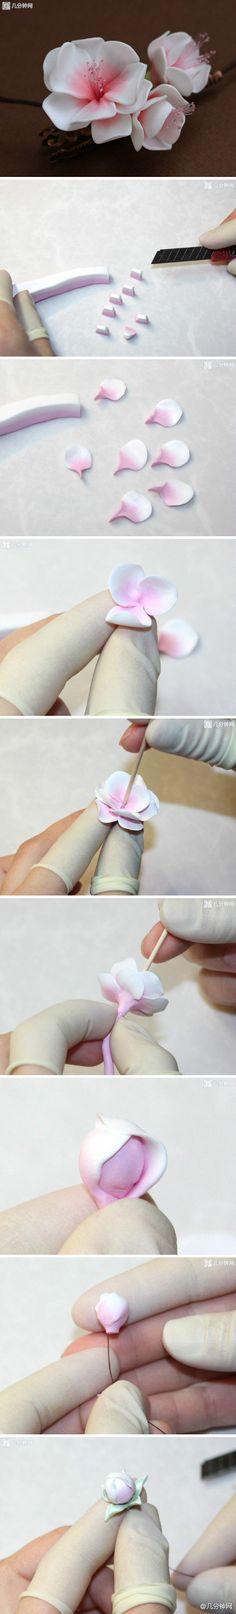 DIY Marshmallow Flower